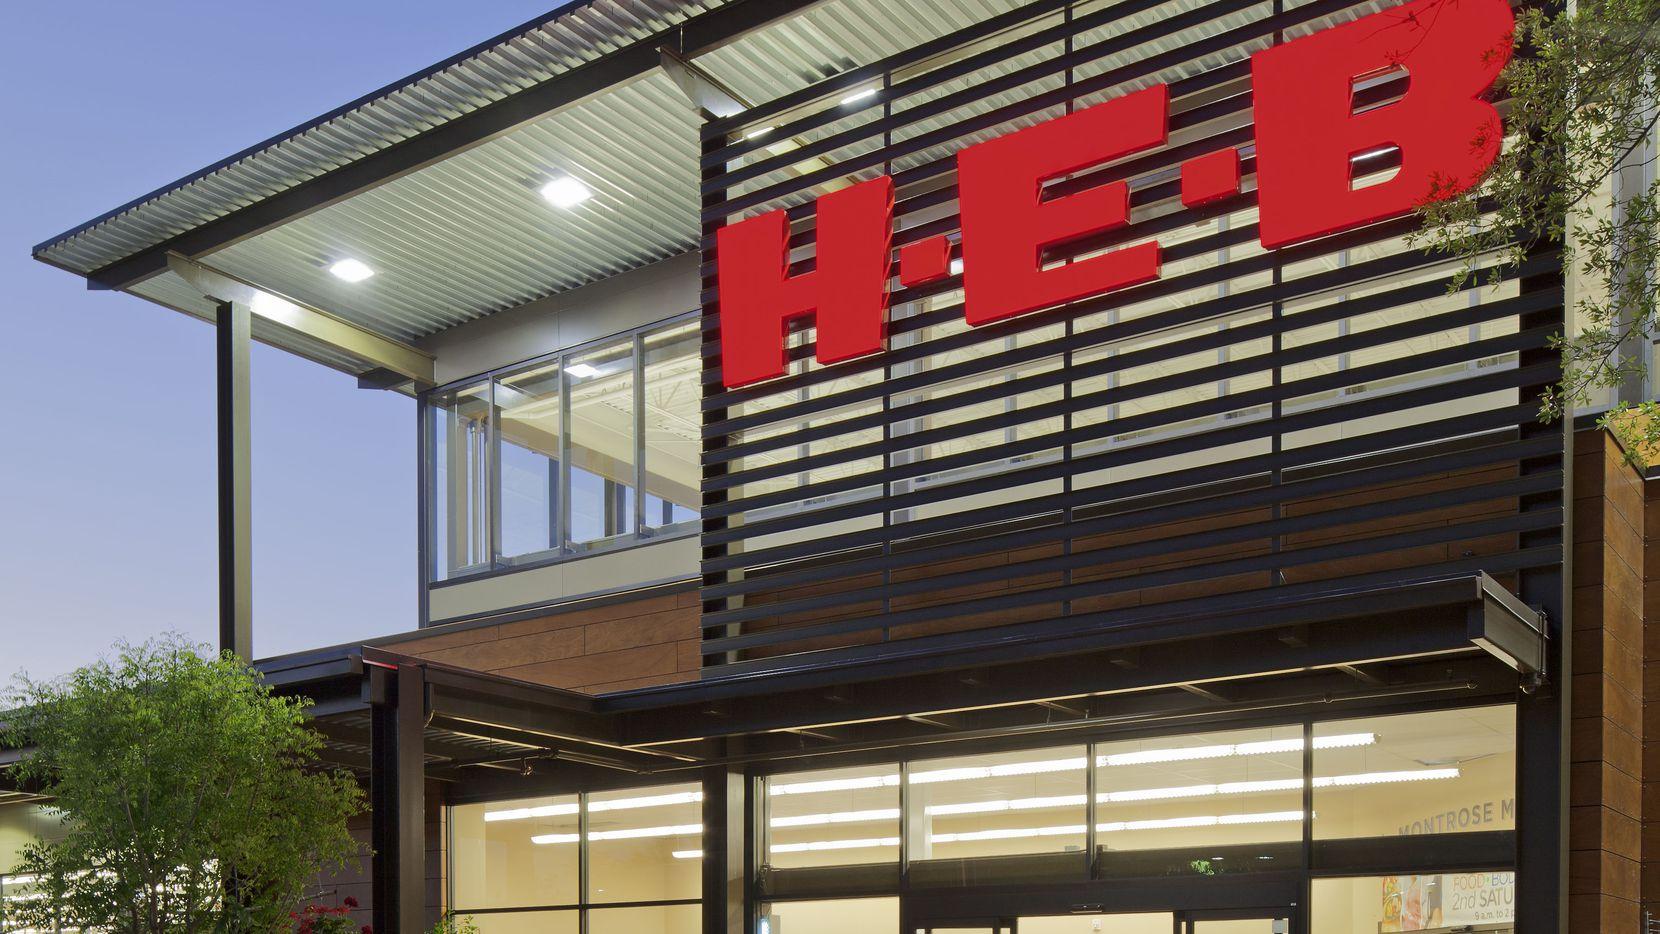 H-E-B storefront.